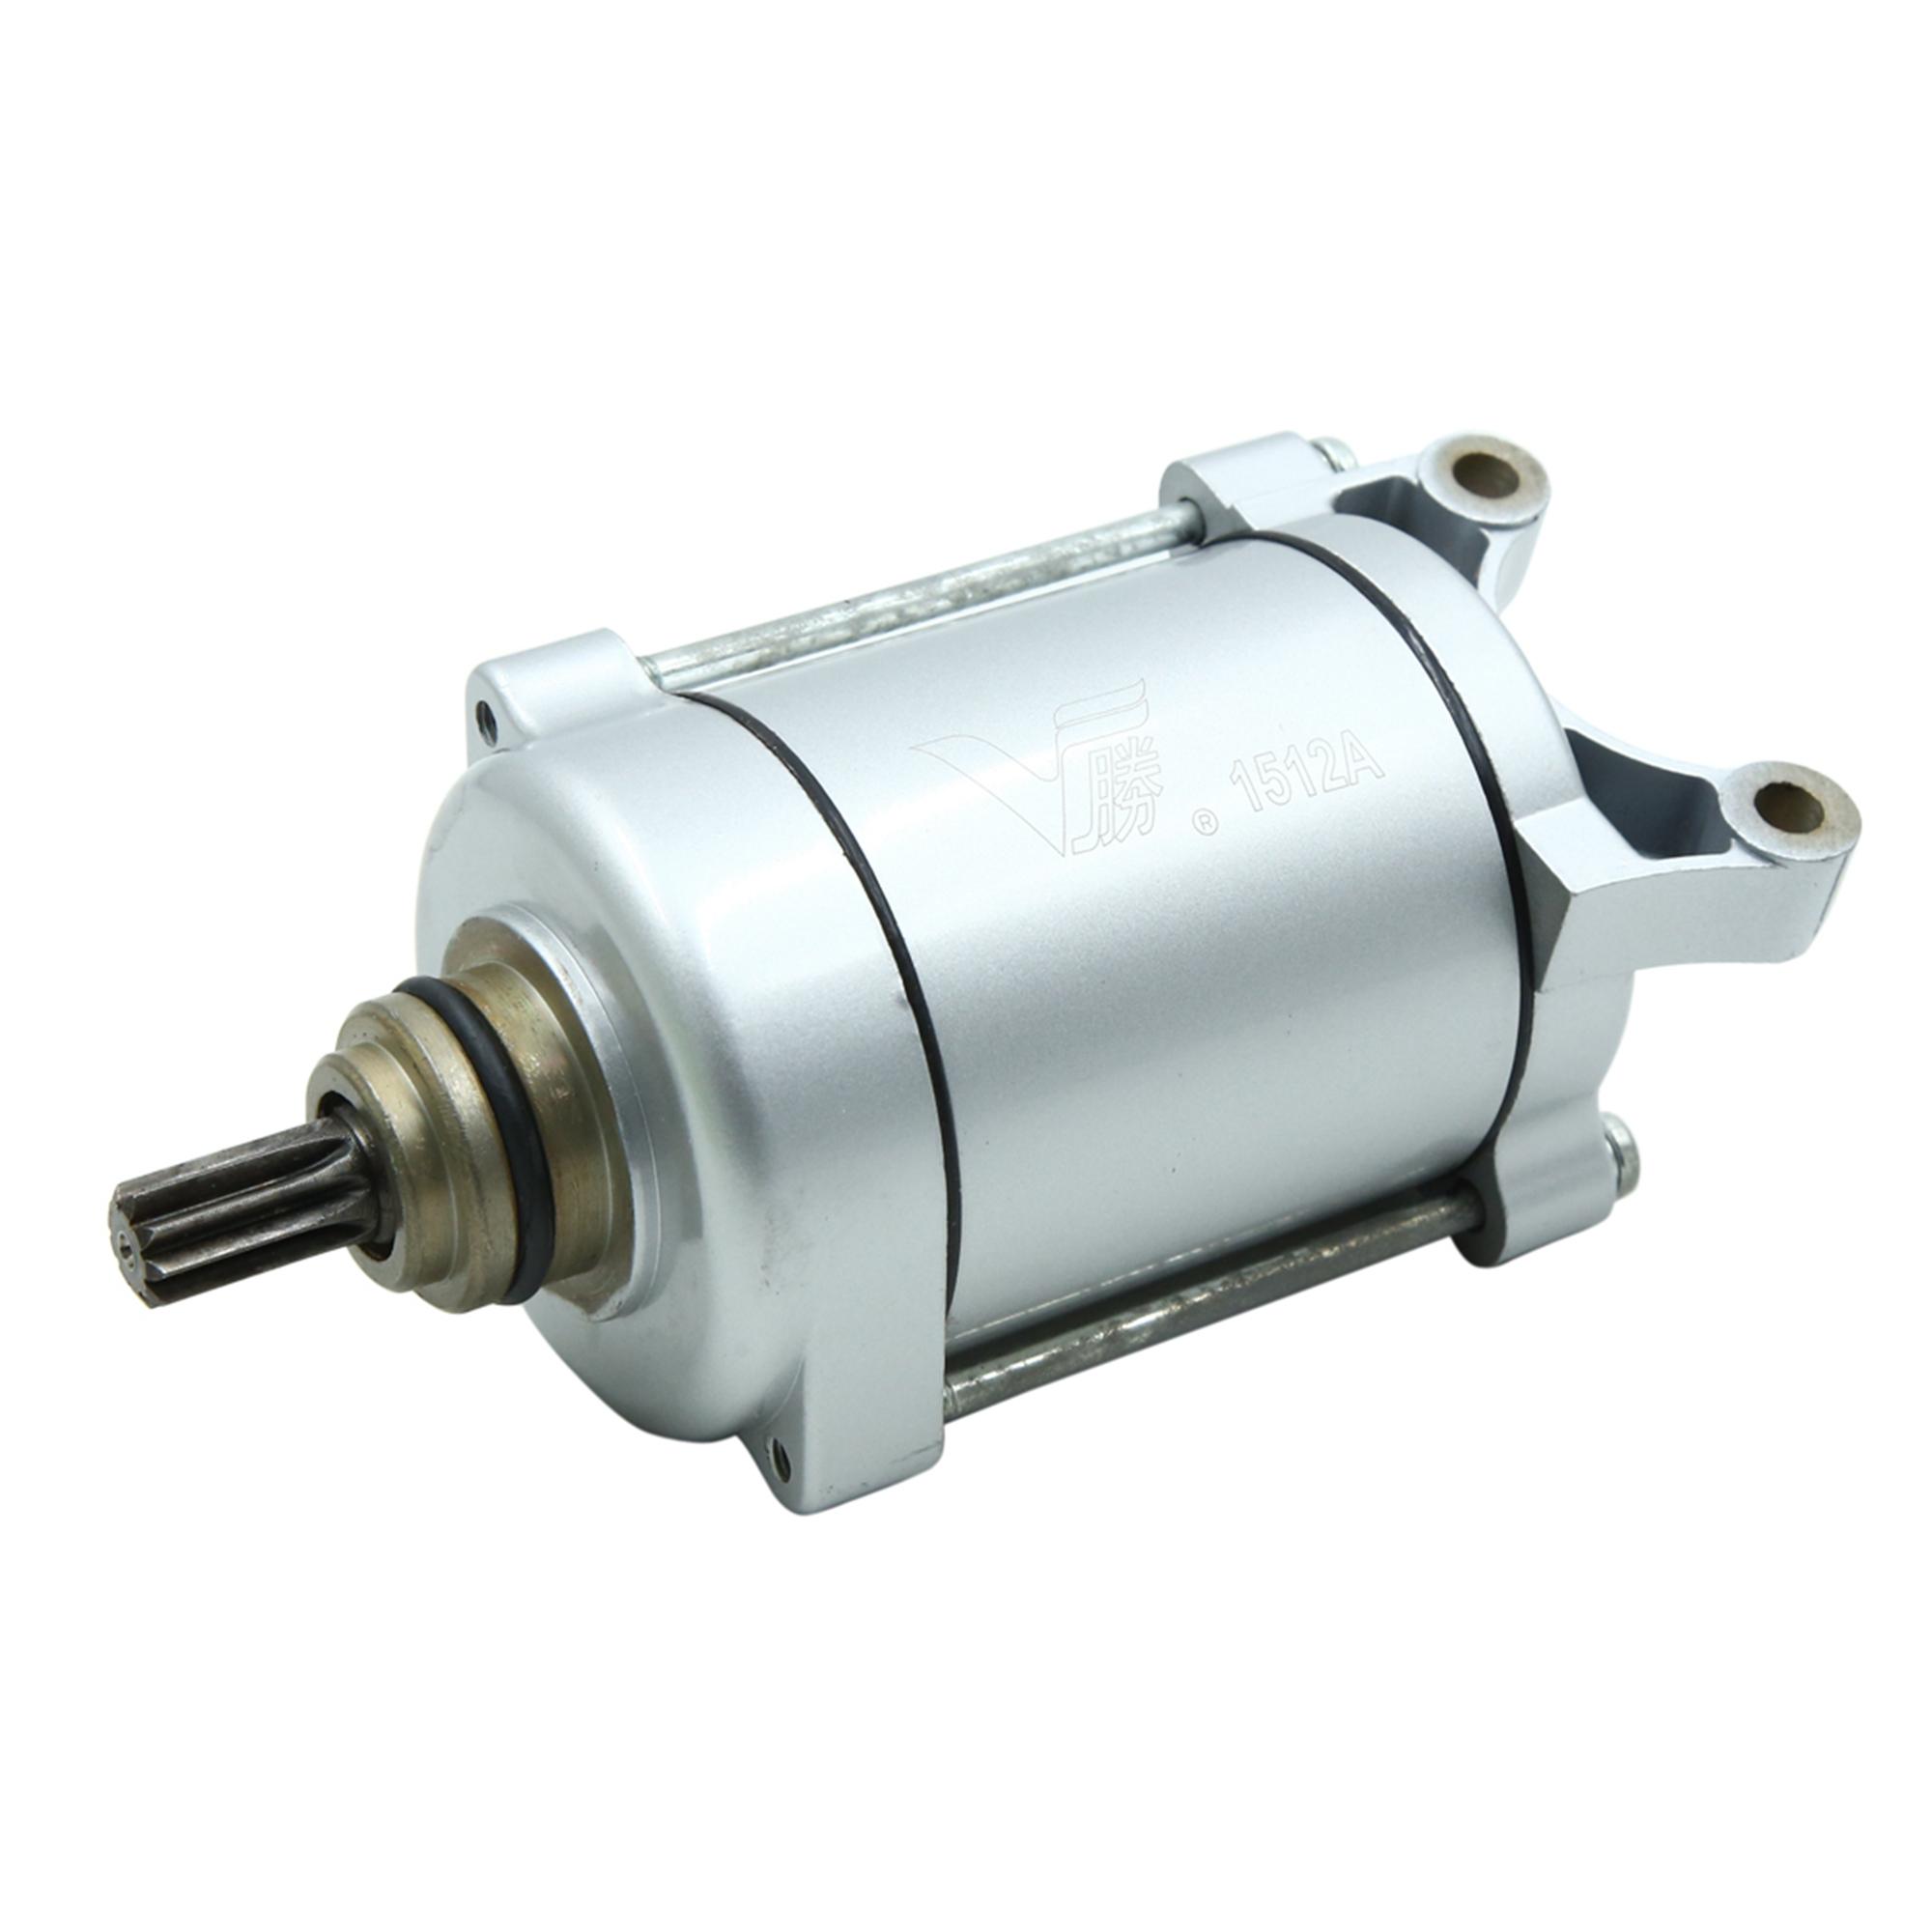 Silver Tone Motorcycle Motorbike Engine Power Starter Motor for Honda CG-125